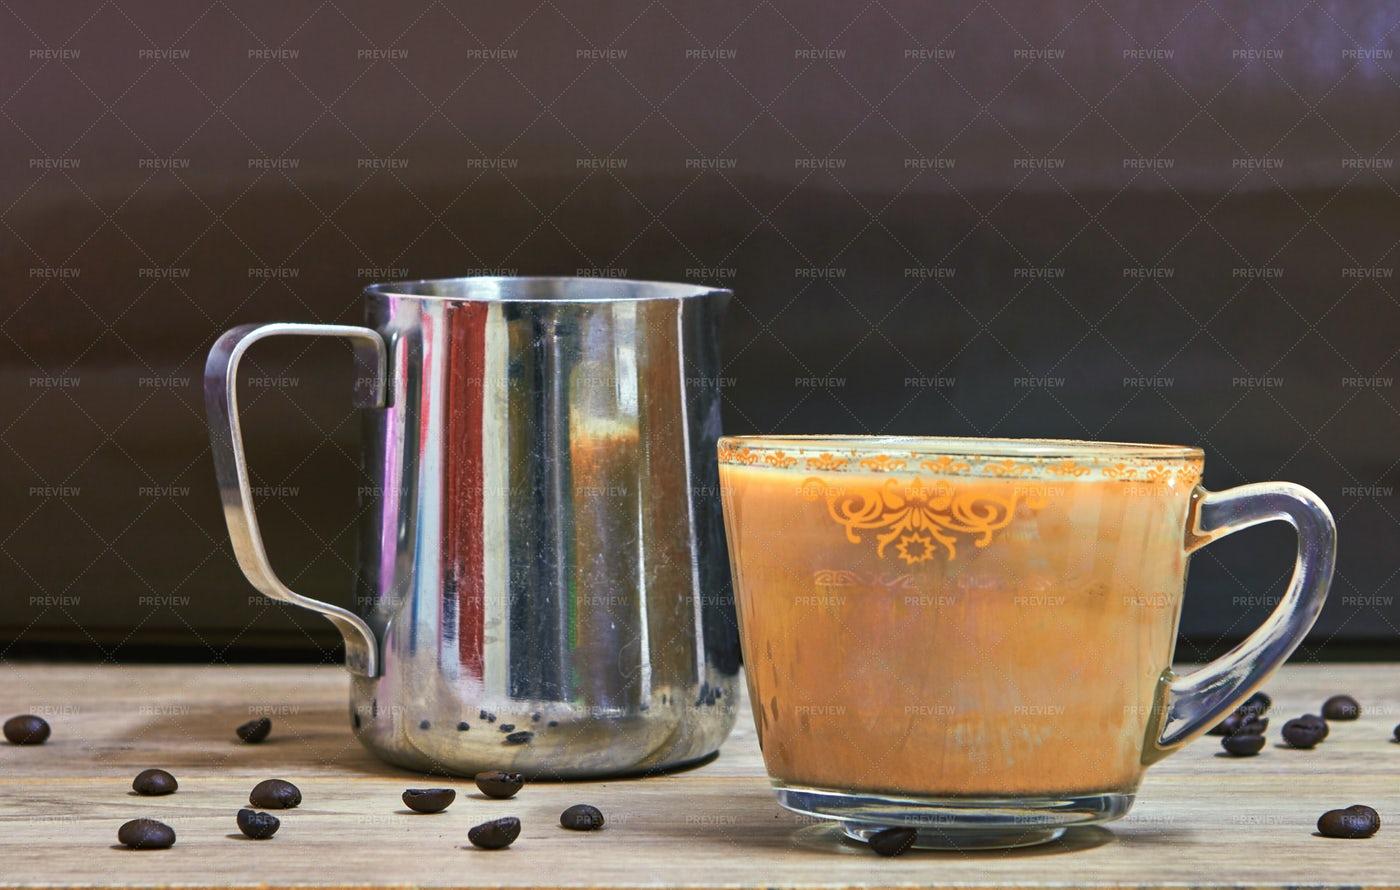 Cappuccino And Jar With Milk: Stock Photos